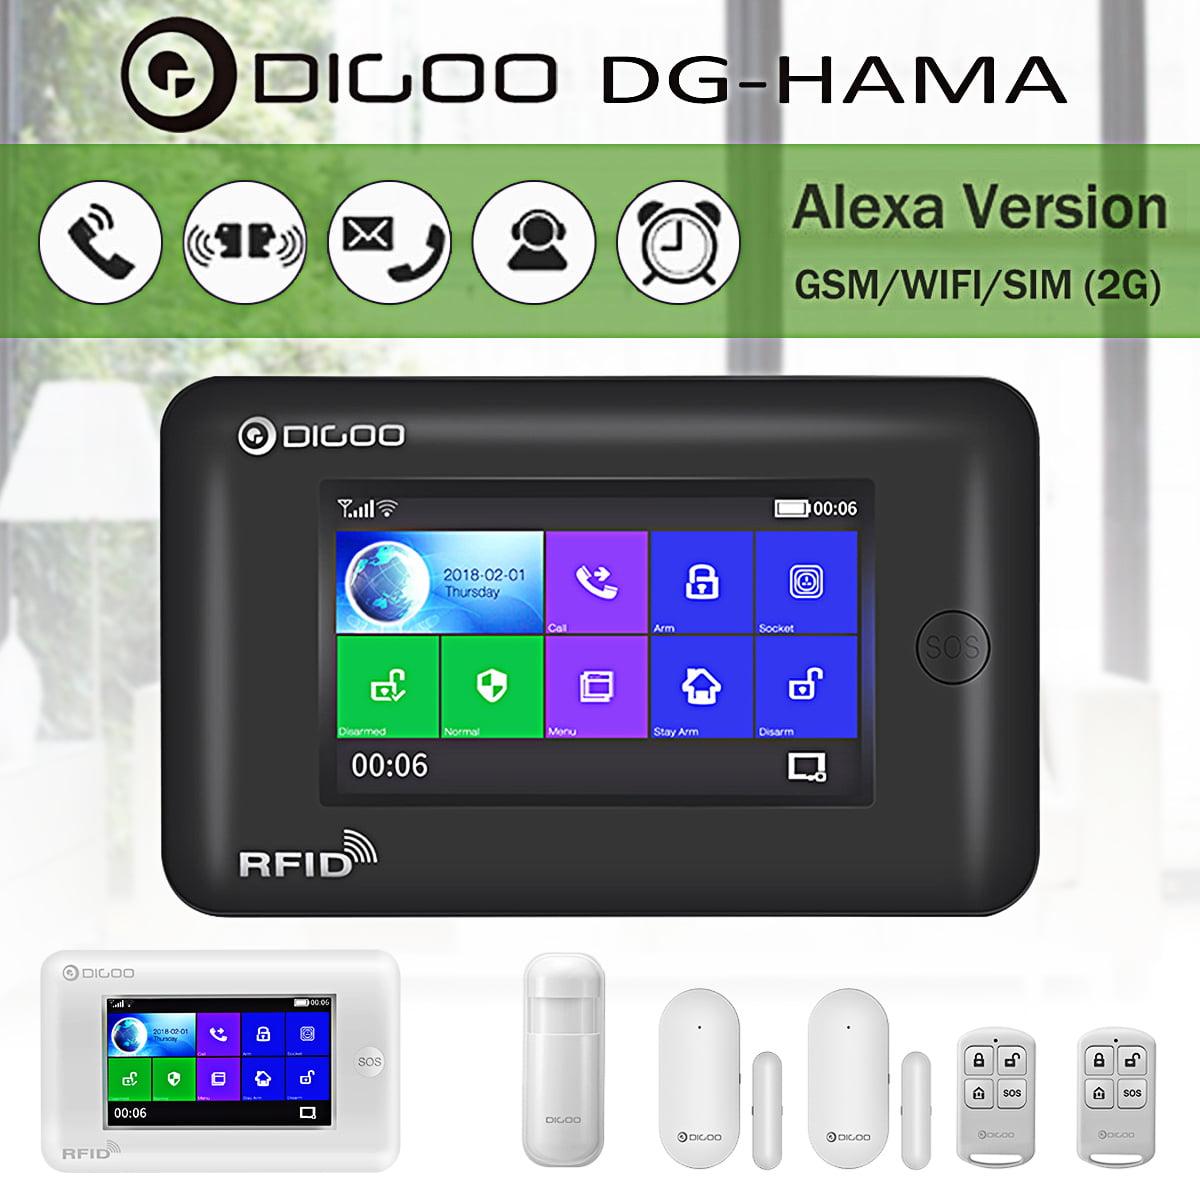 DIGOO DG-HAMA Touch Screen 433MHz GSM WIFI DIY Smart Home Burglar Security Alarm Alert System Accessories,Auto Dial Call wirelessalarmsystem SMS Message Push,Phone APP Control PIR Window Door Detector